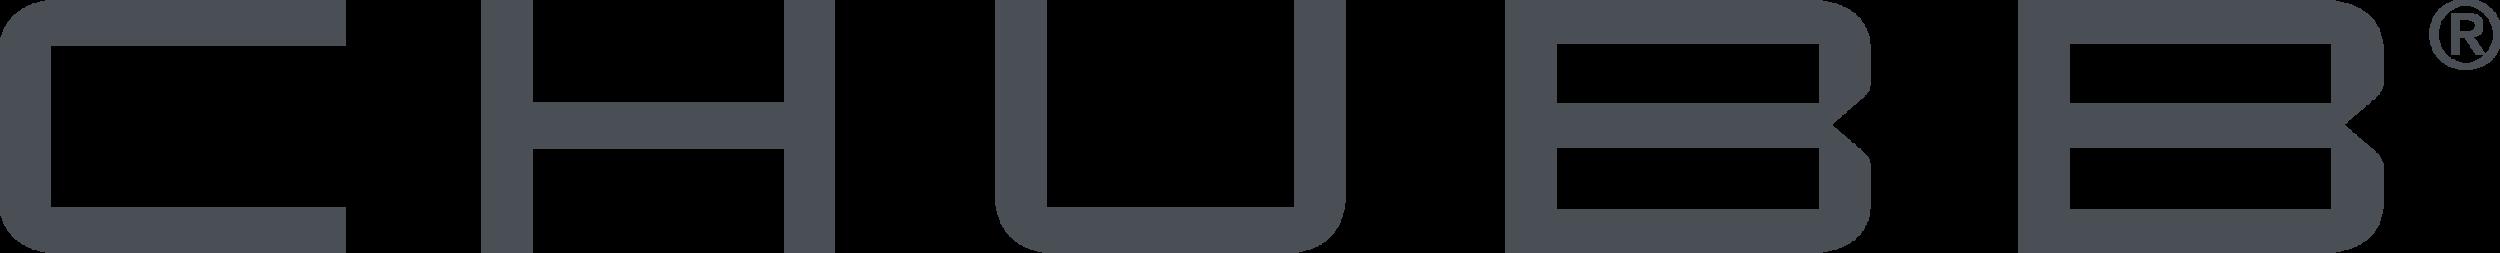 CHUBB_Logo_DarkGrey_RGB.png